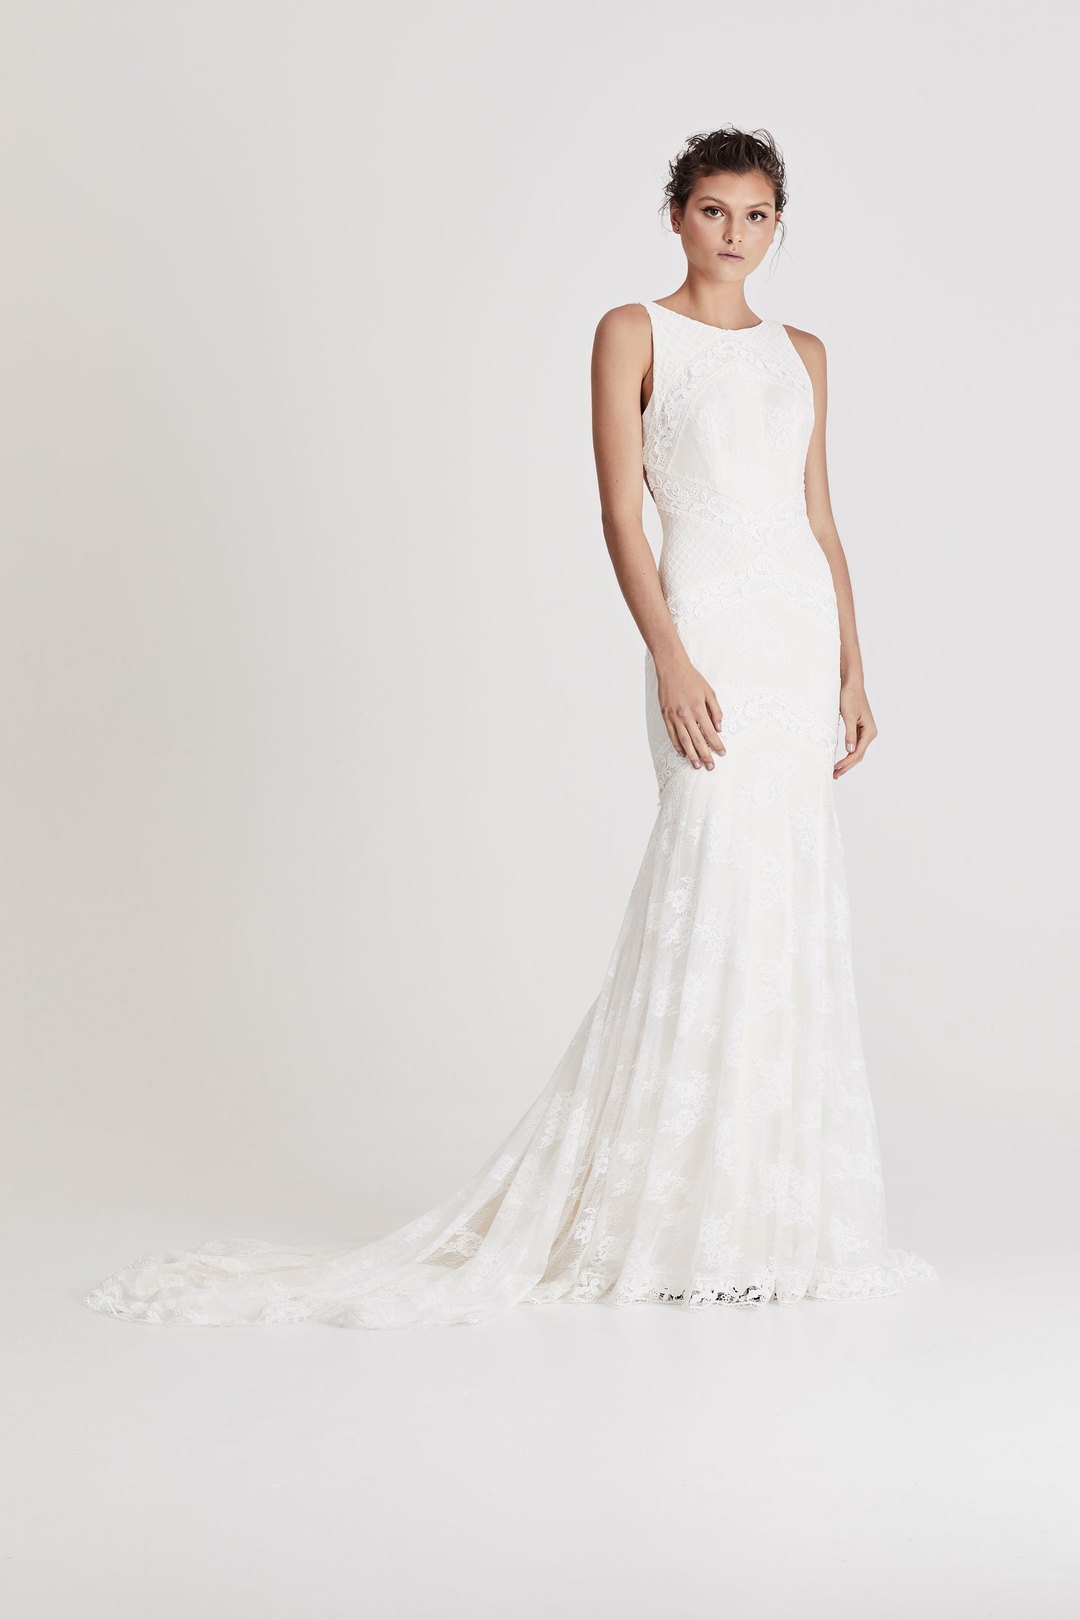 francis dress photo